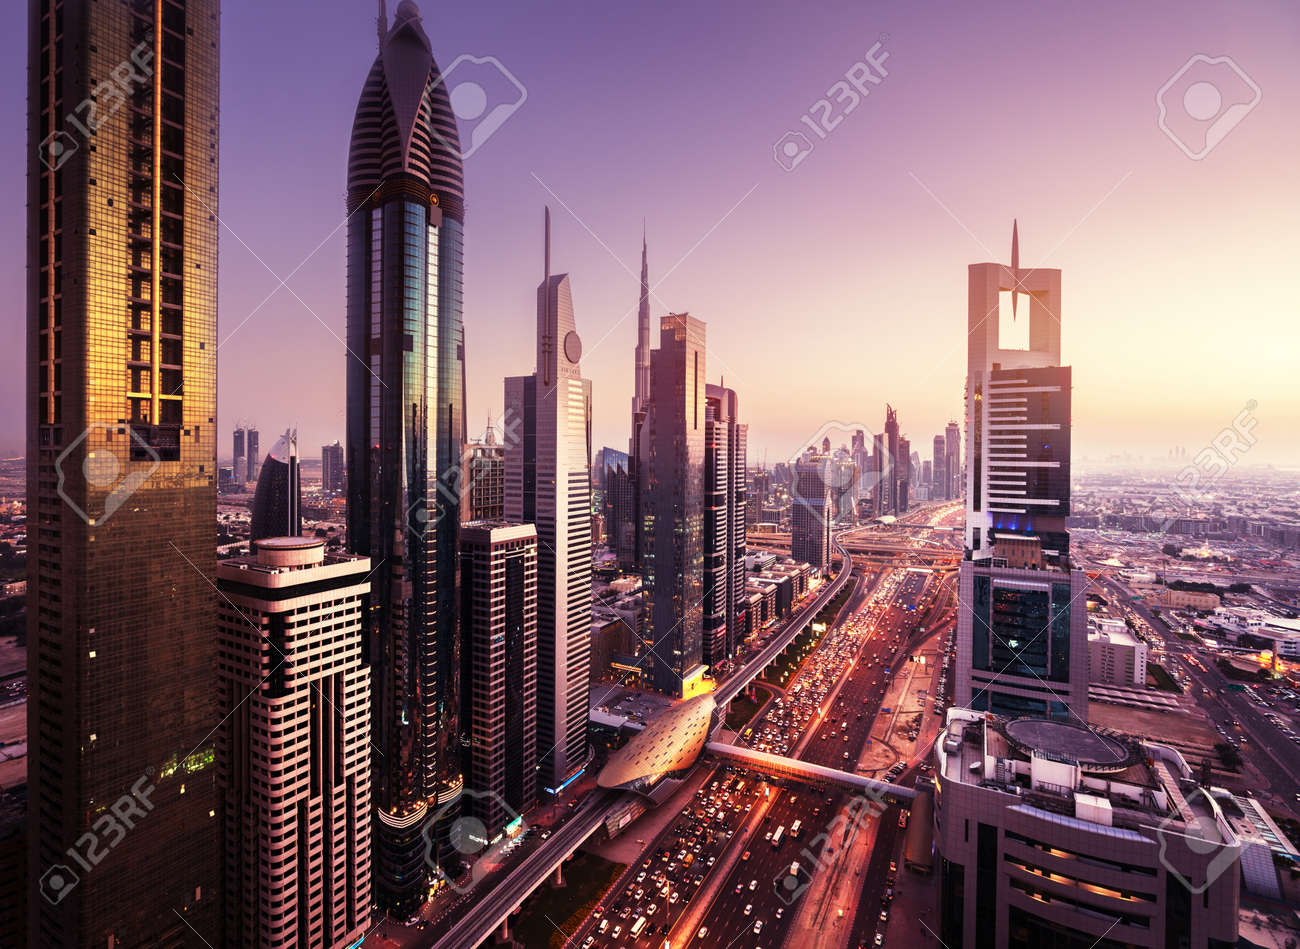 Dubai skyline in sunset time, United Arab Emirates - 55482472